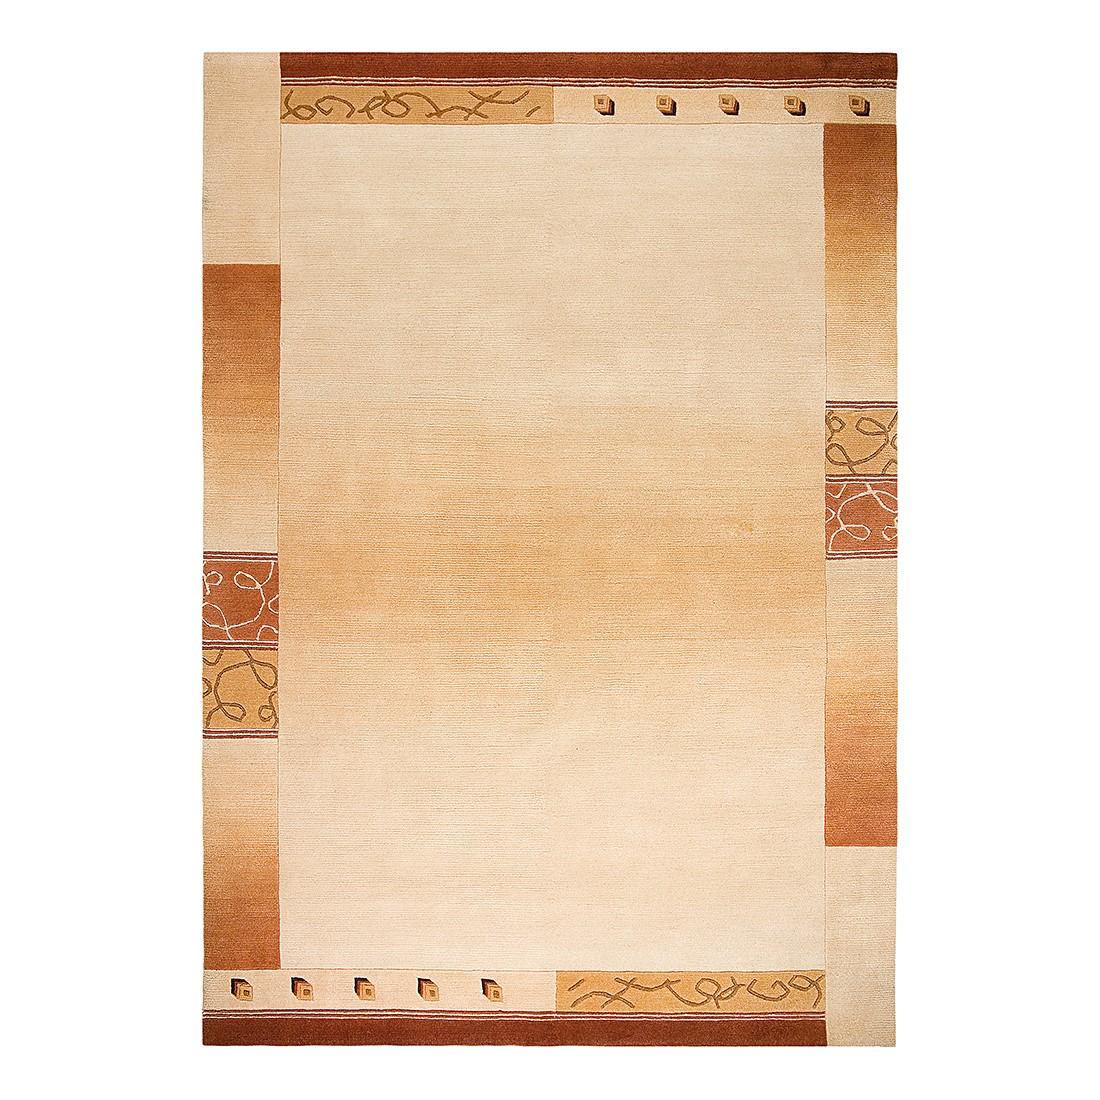 Tapijt Super Q - wol/vanillekleurig - 170x240cm, Luxor living